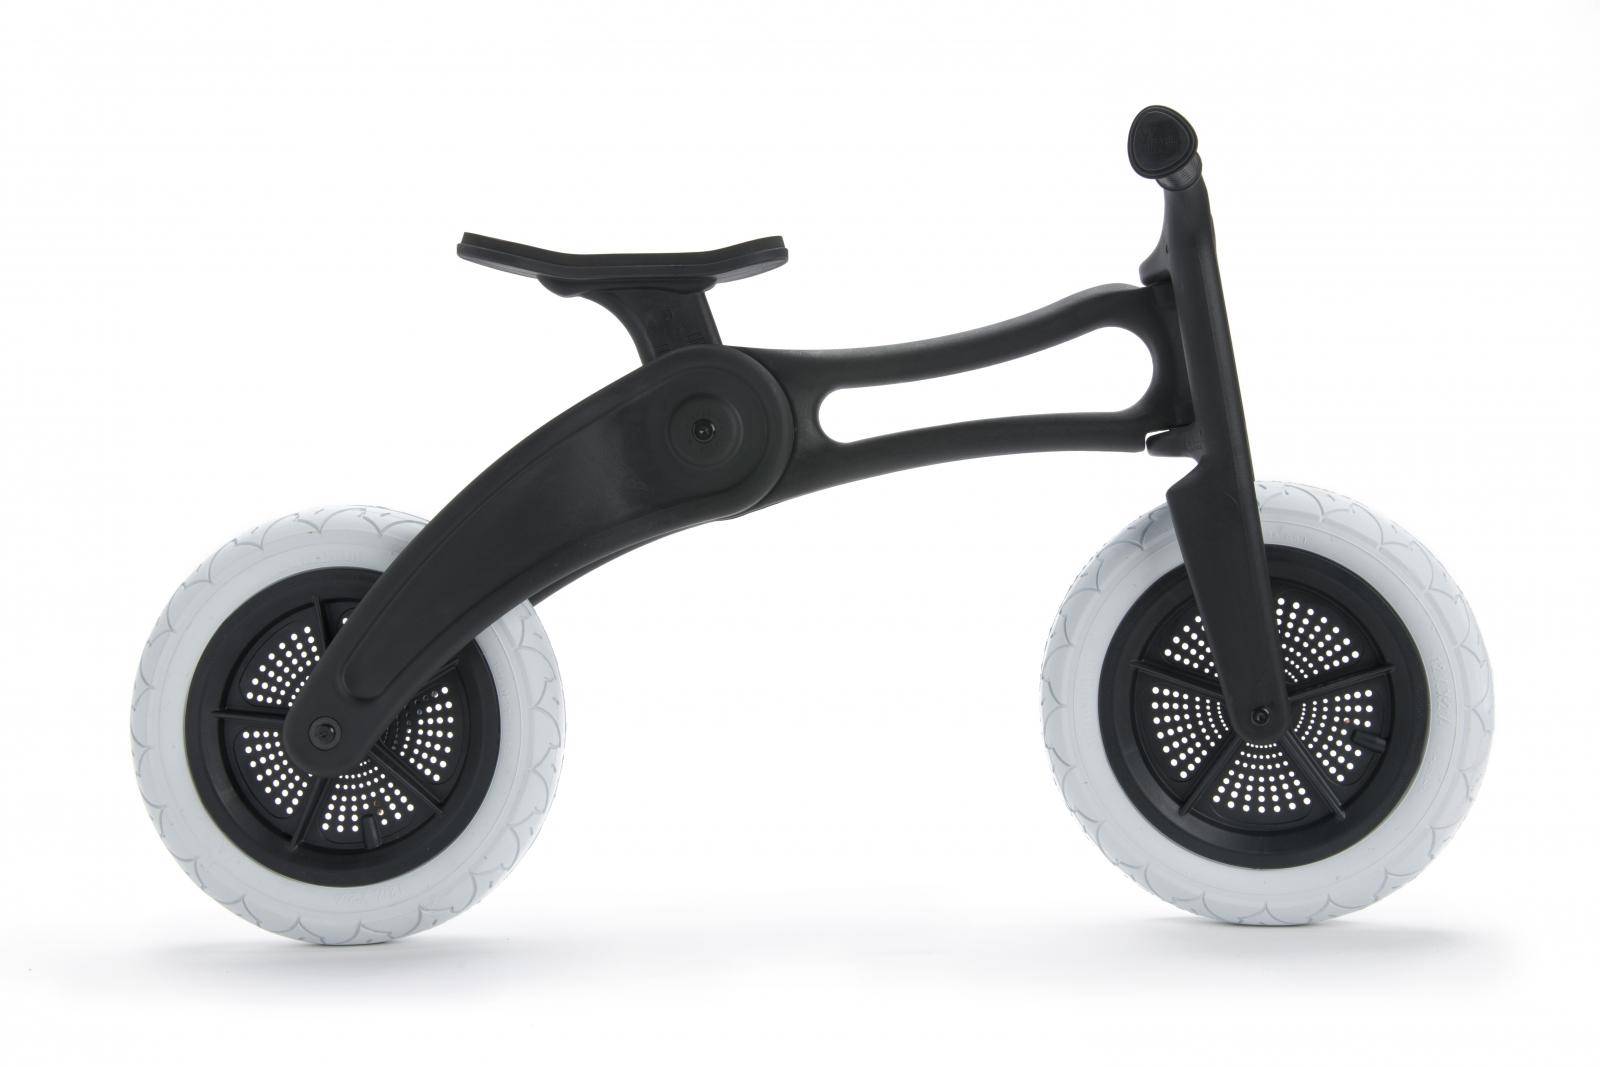 Wishbone Bike Recycled Edition 3-in-1